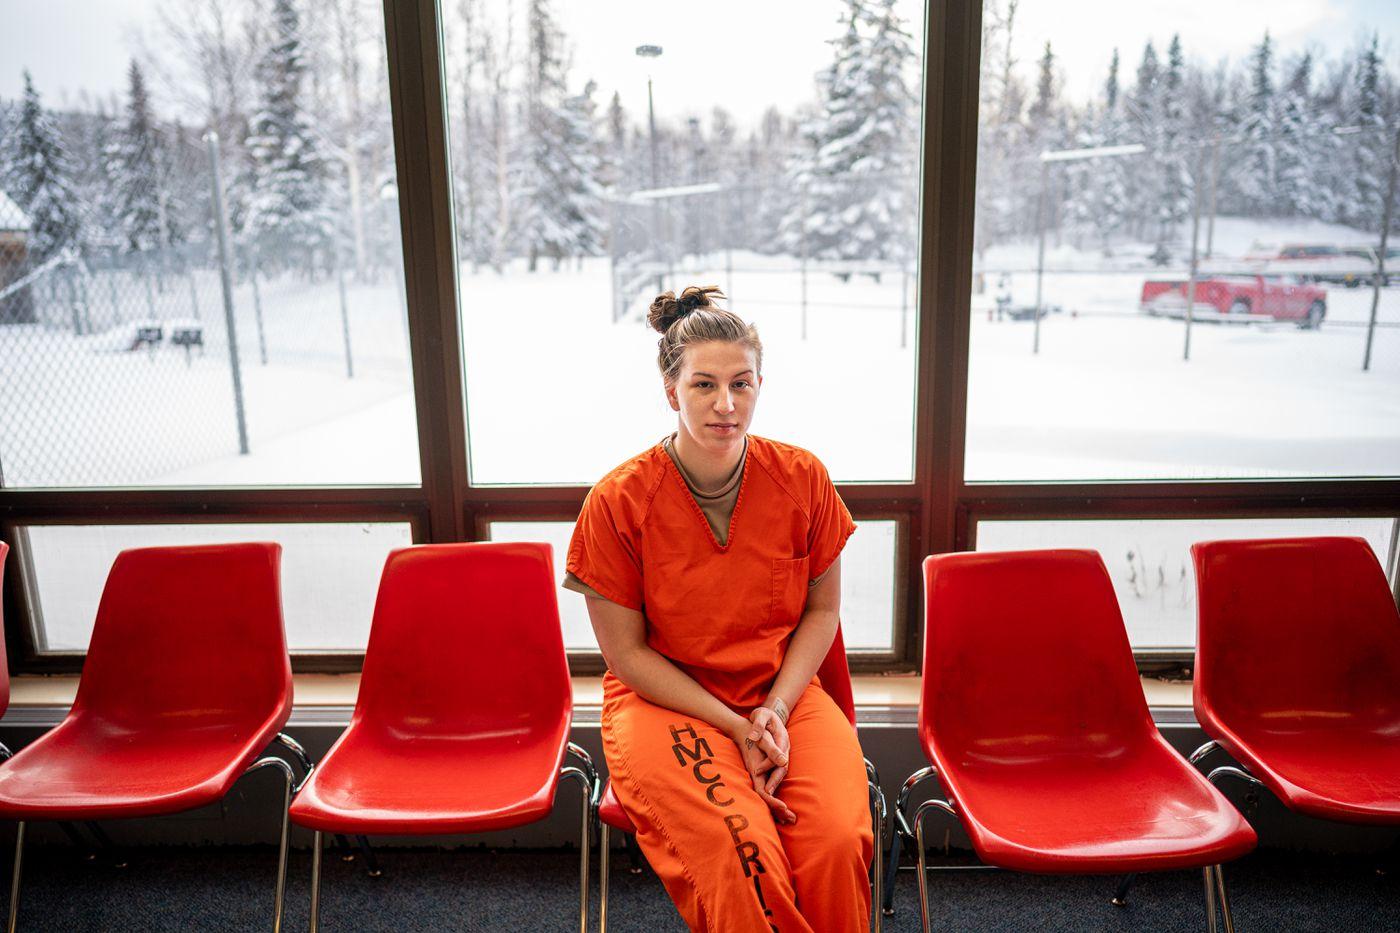 Ricki Dahlin in a prison visitation room at the Hiland Mountain Correctional Center near Eagle River. (Loren Holmes / Anchorage Daily News)